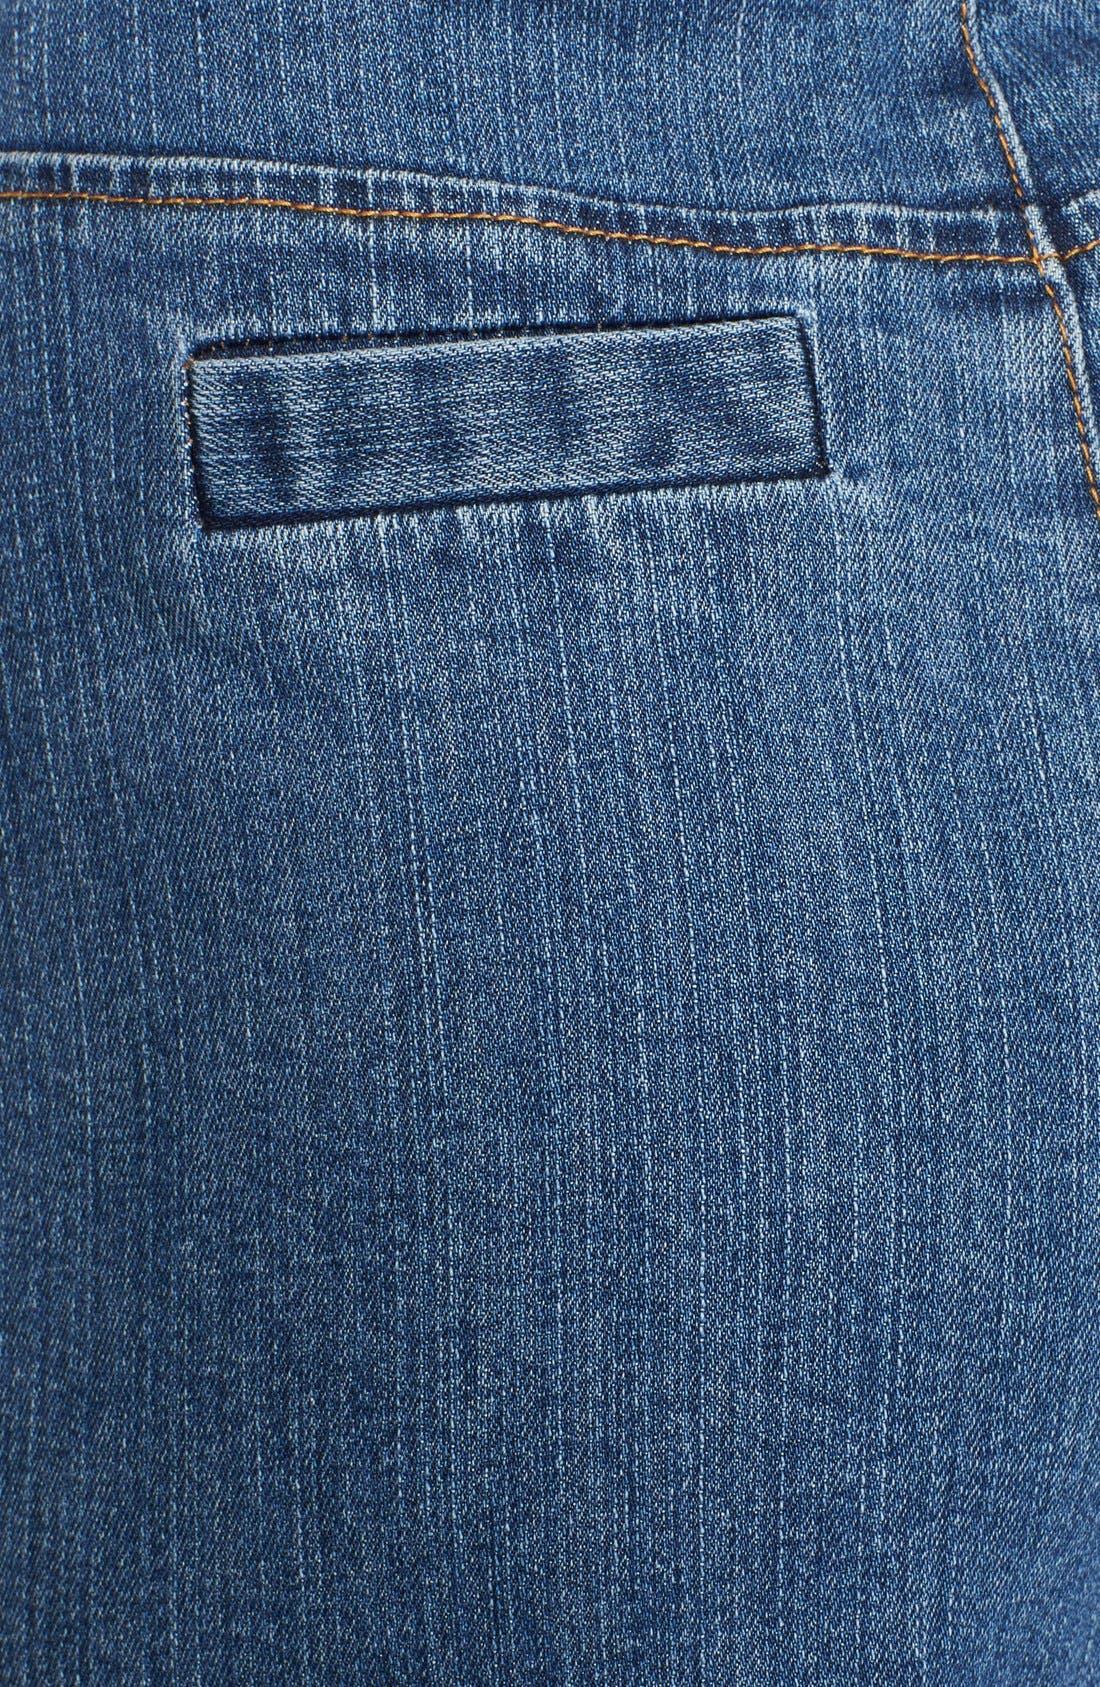 Alternate Image 3  - Rachel Zoe 'Ella' Braided Waist Wide Leg Jeans